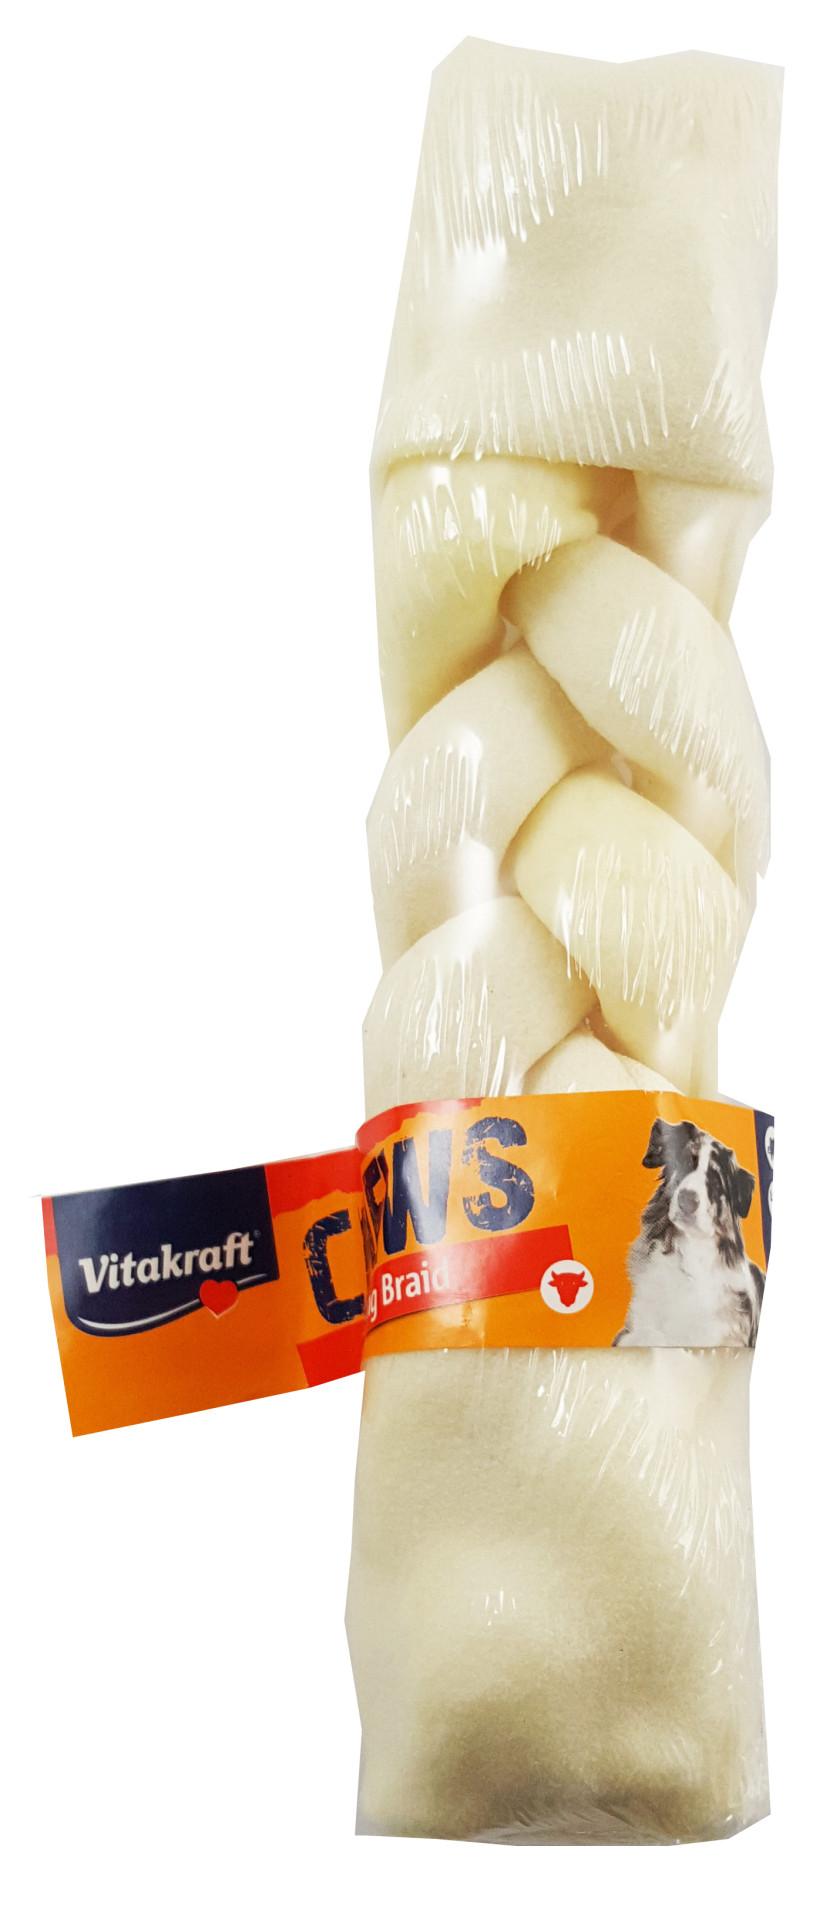 Vitakraft Chewing braid 20 cm